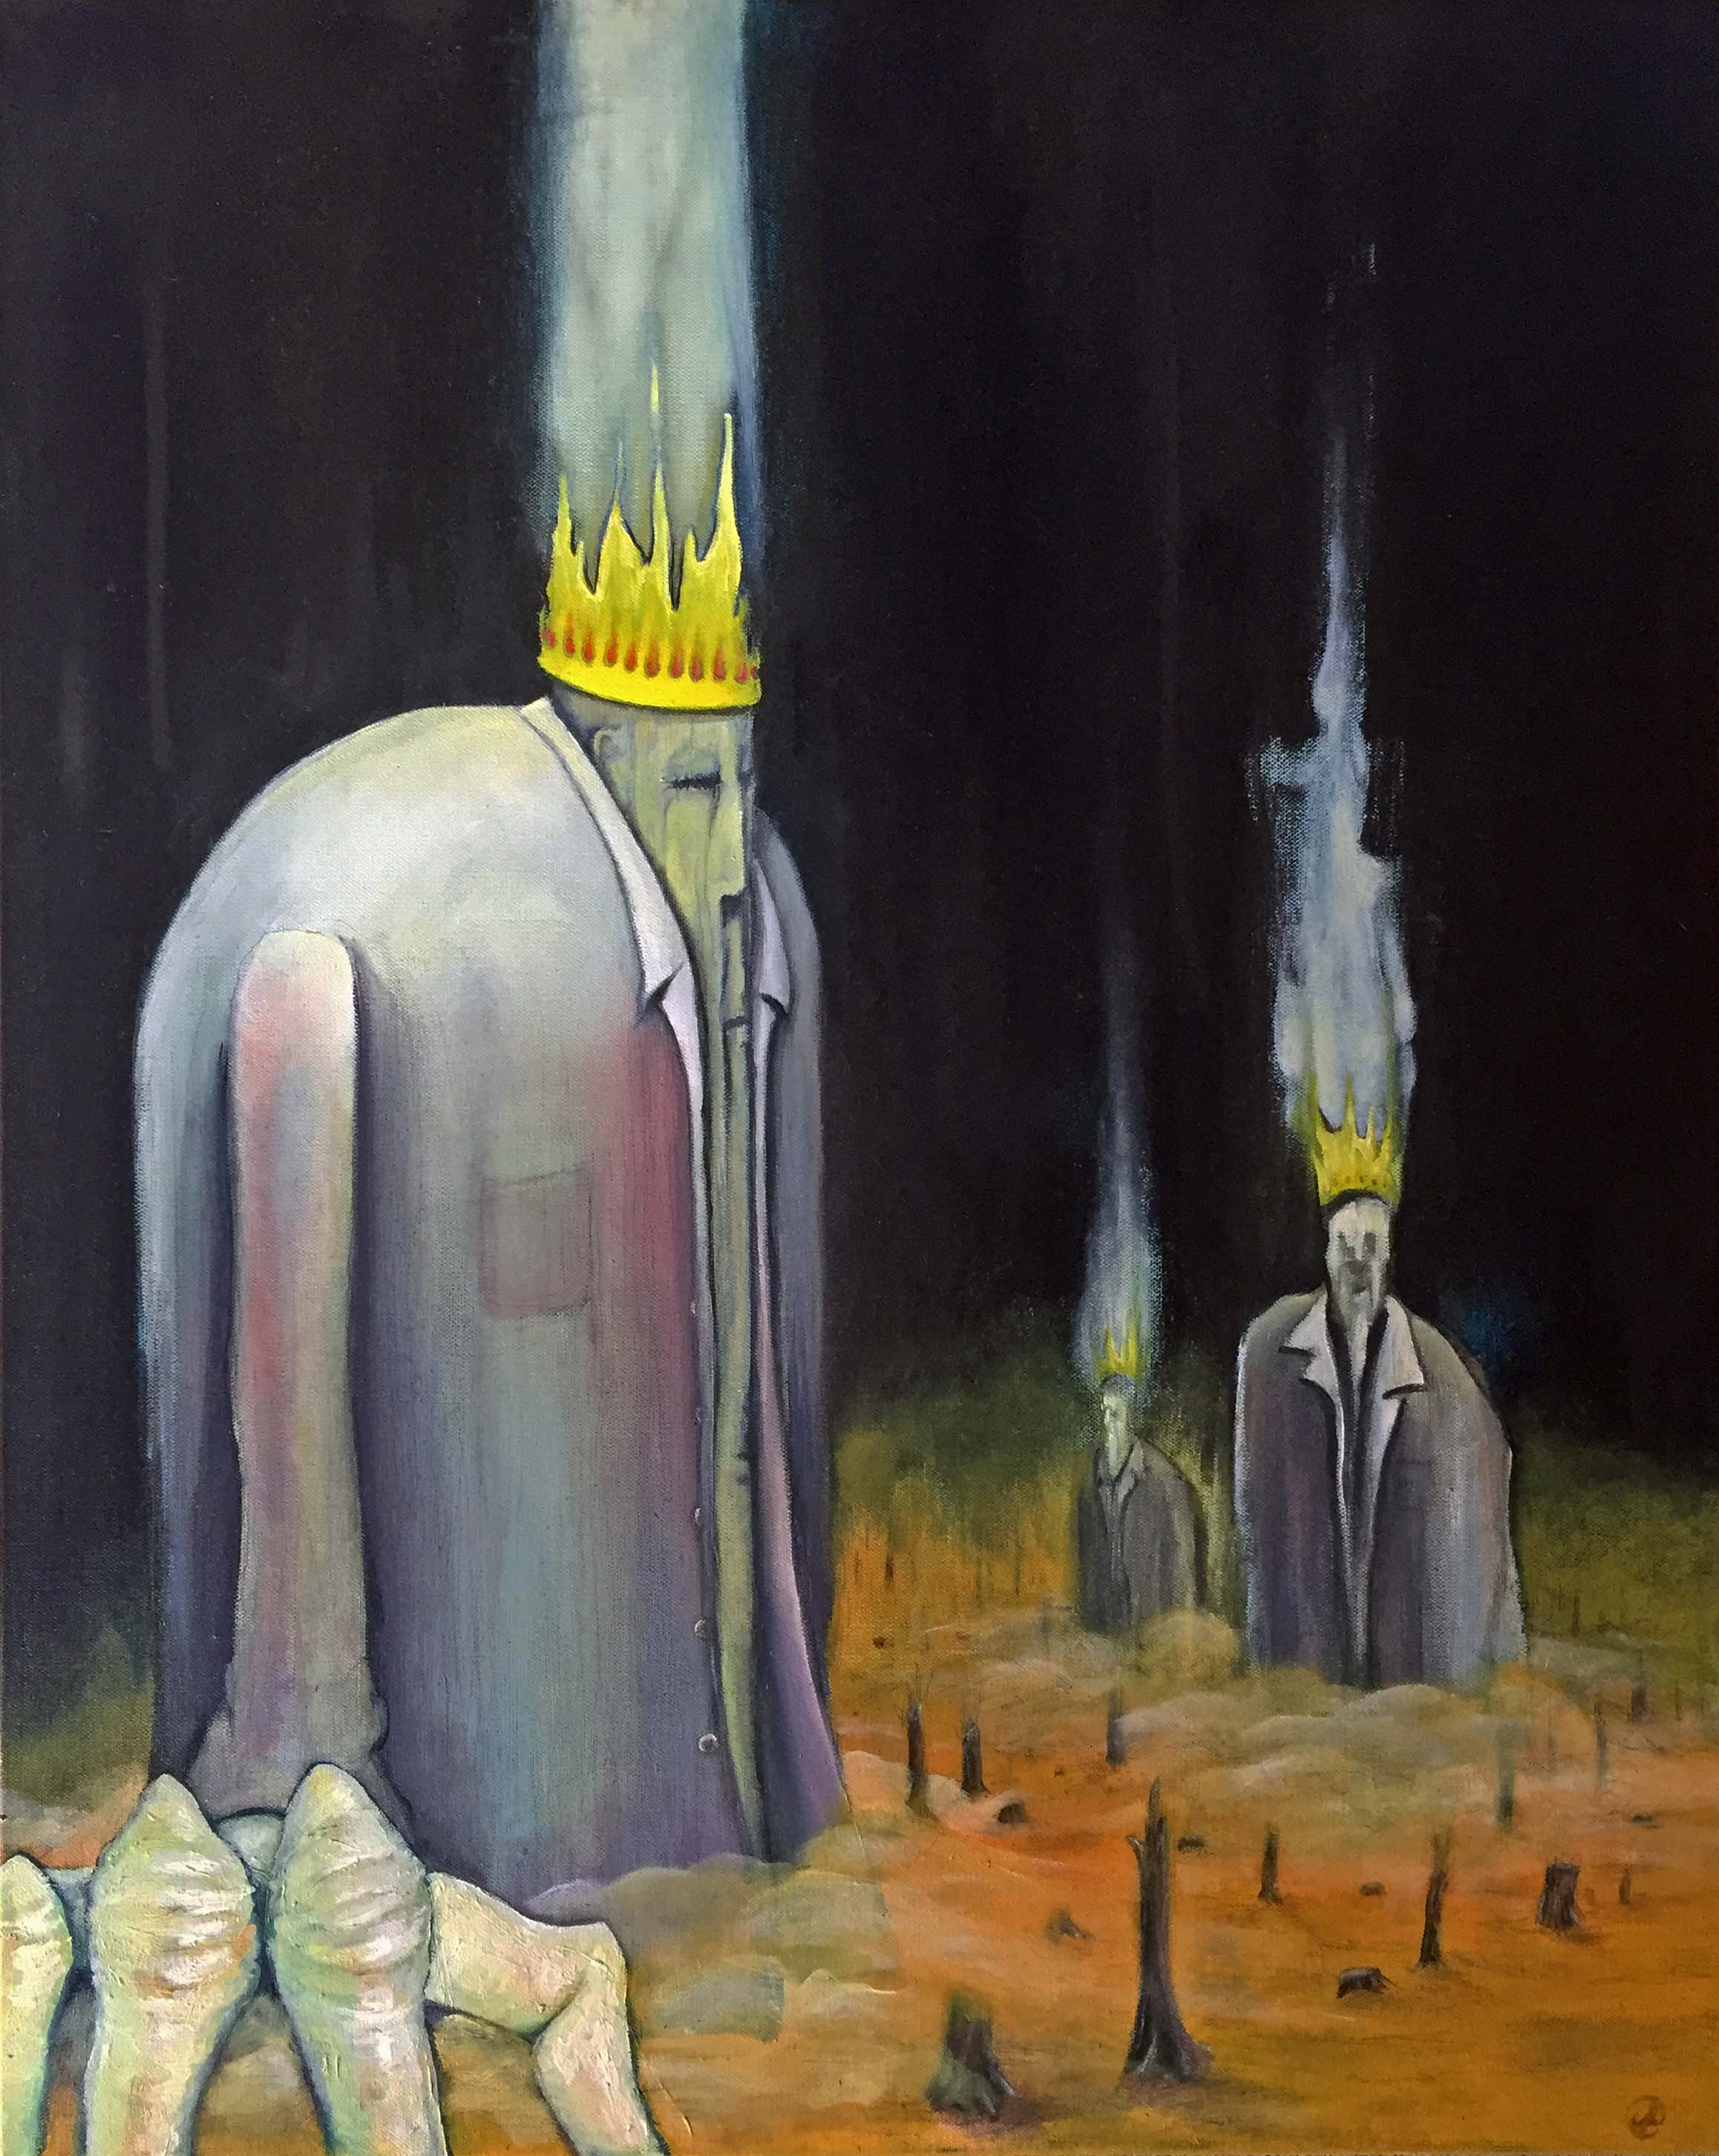 James Rosin, Self-Proclaimed Kings